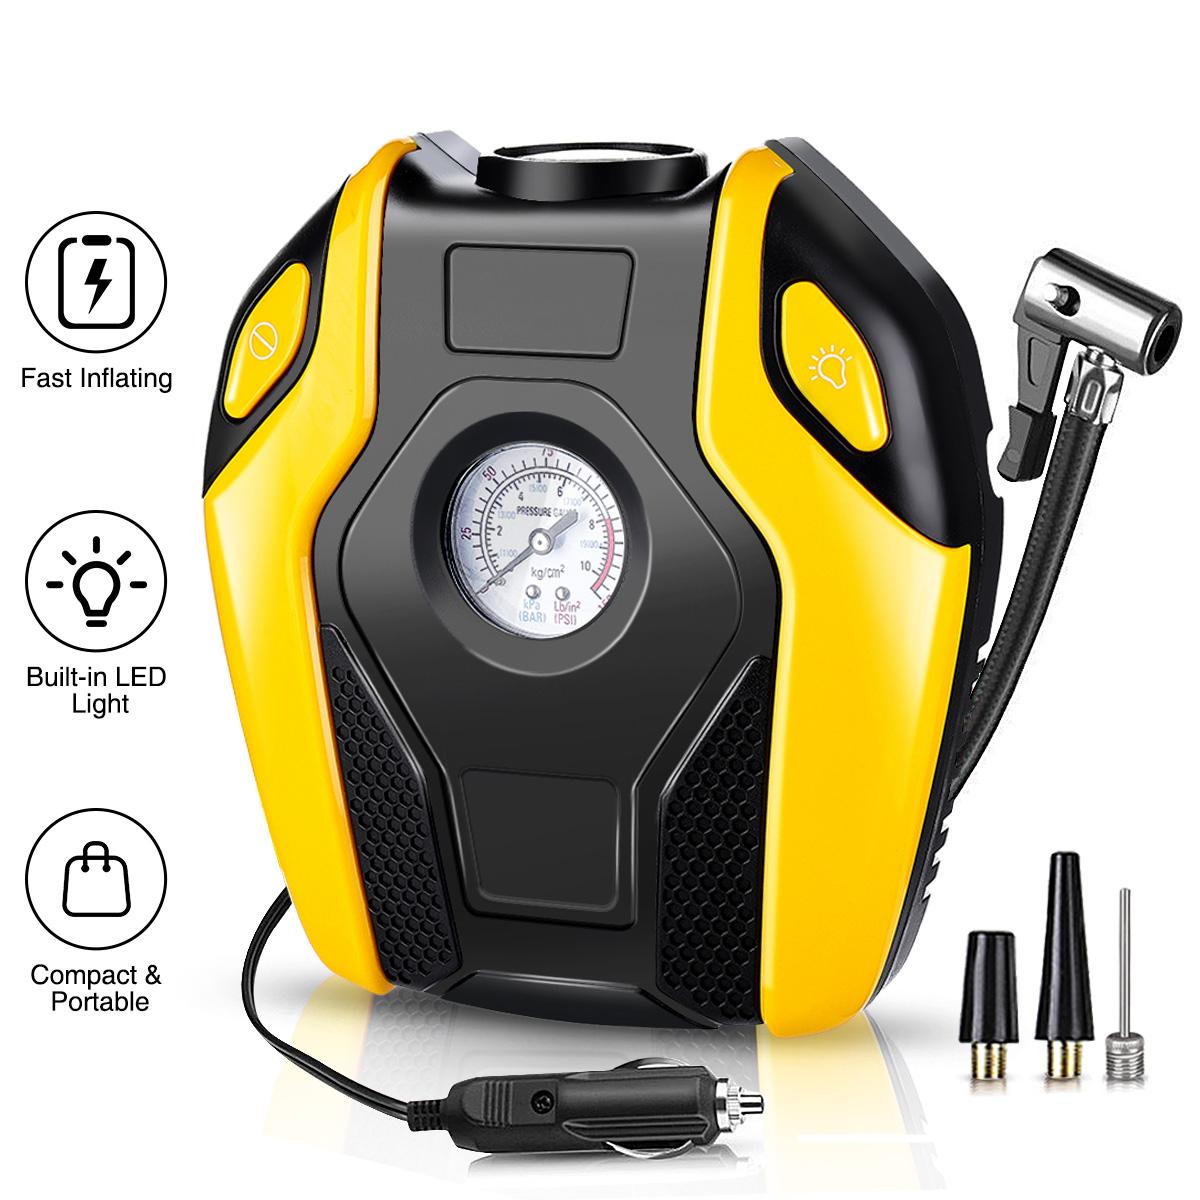 Augienb Portable Electric Air Compressor